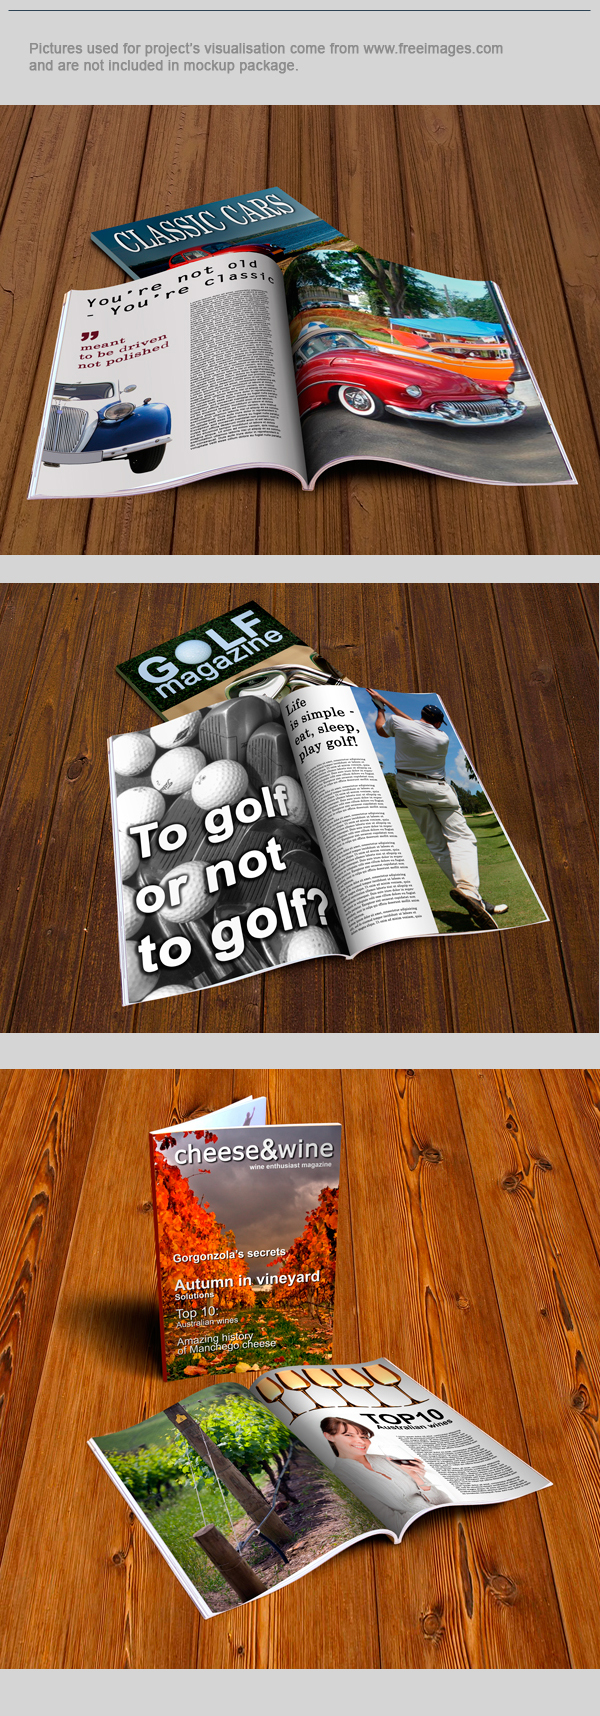 magazine,Mockup,free,design